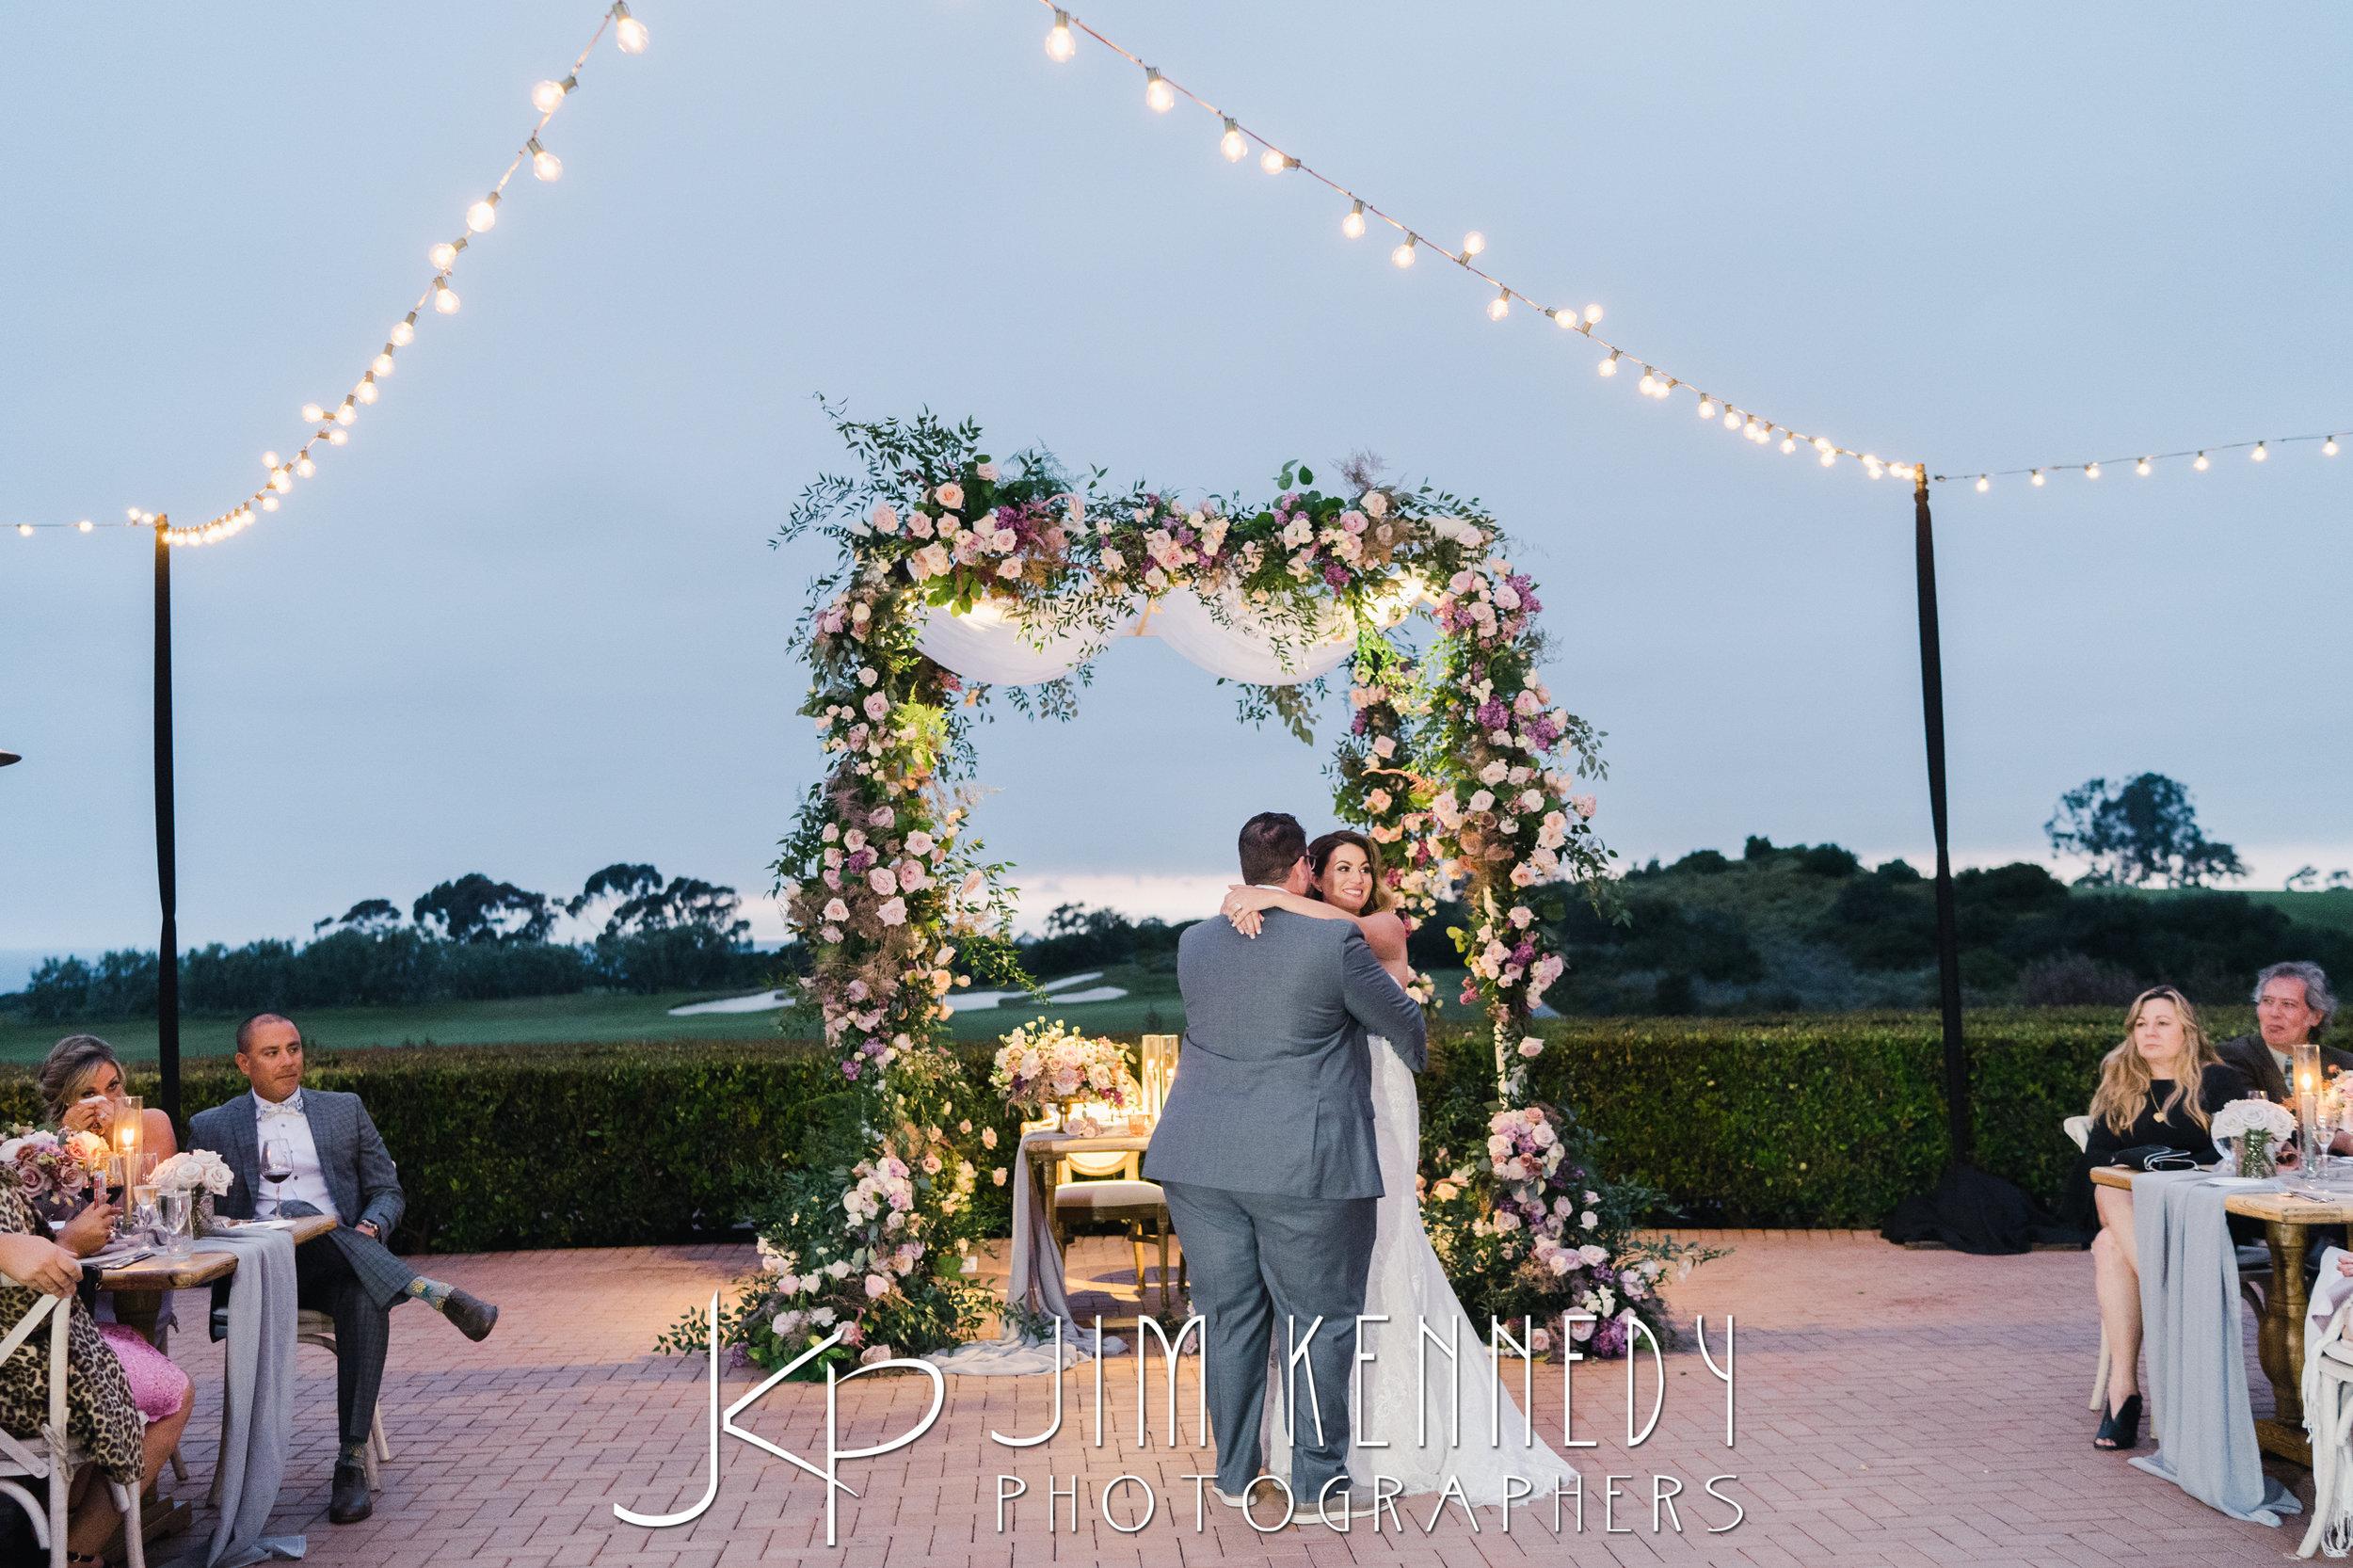 pelican-hill-wedding-jim-kenedy-photographers_0221.JPG